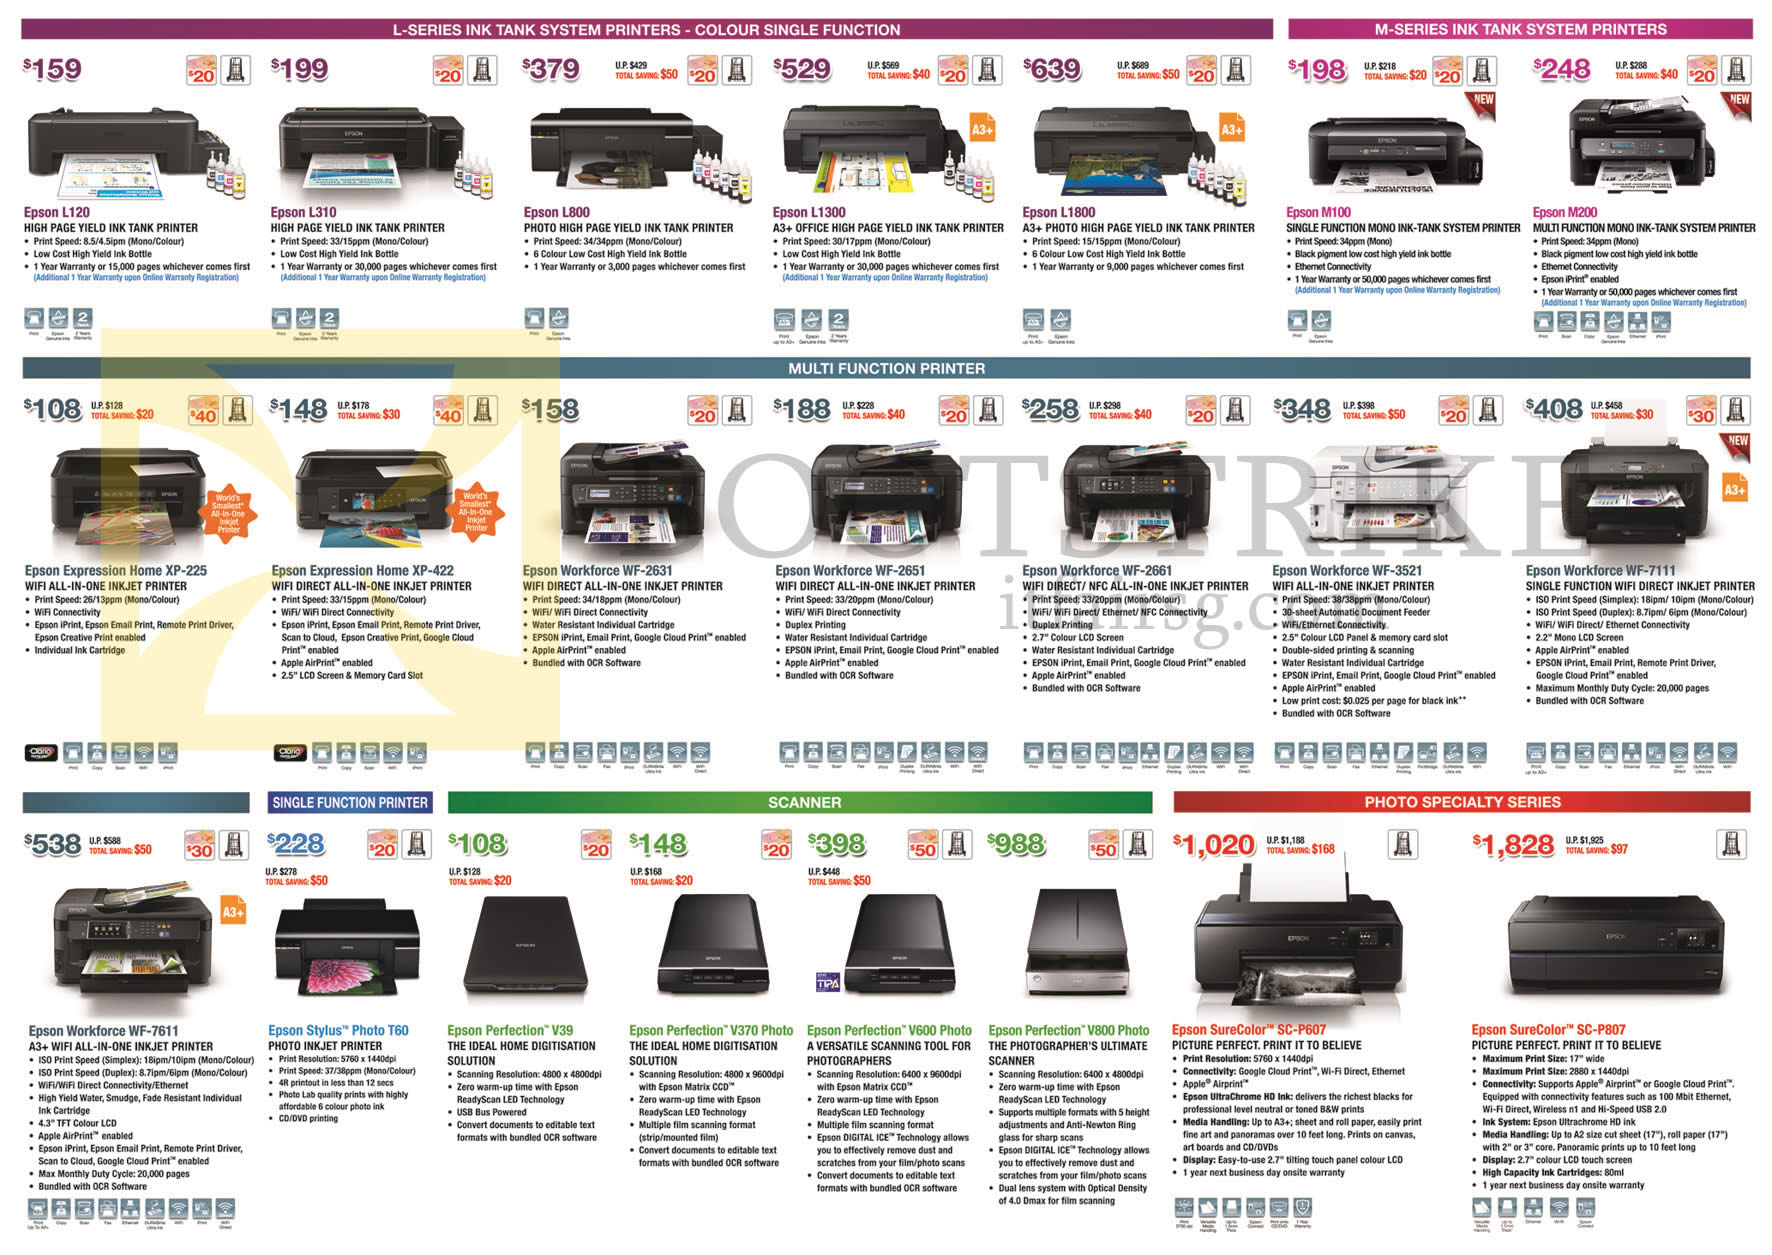 Epson Printers, Scanners, L120, L800, L1300, L1800